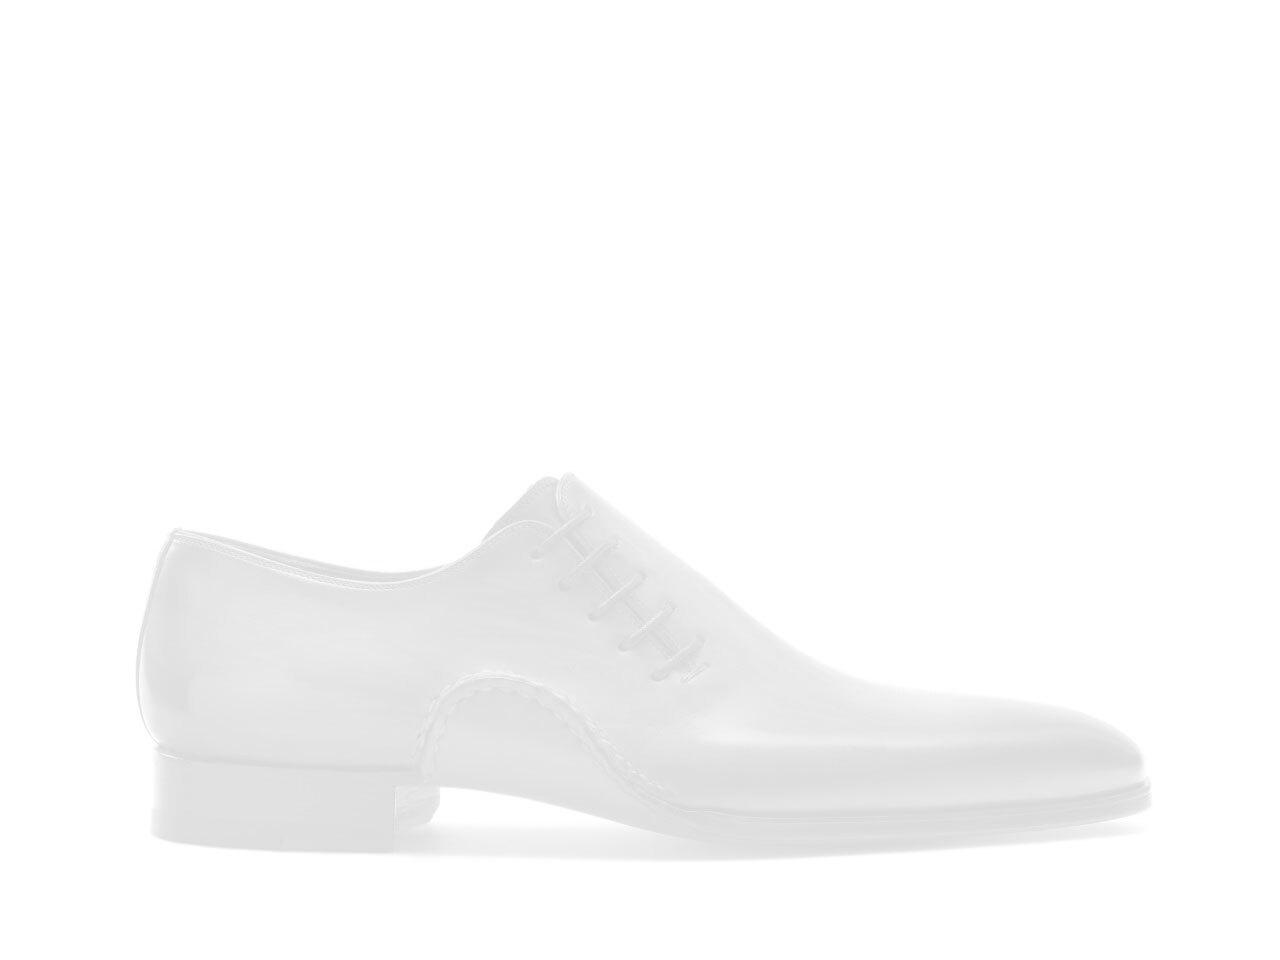 Sole of the Magnanni Cangas II Cognac Suede Men's Single Monk Strap Shoes